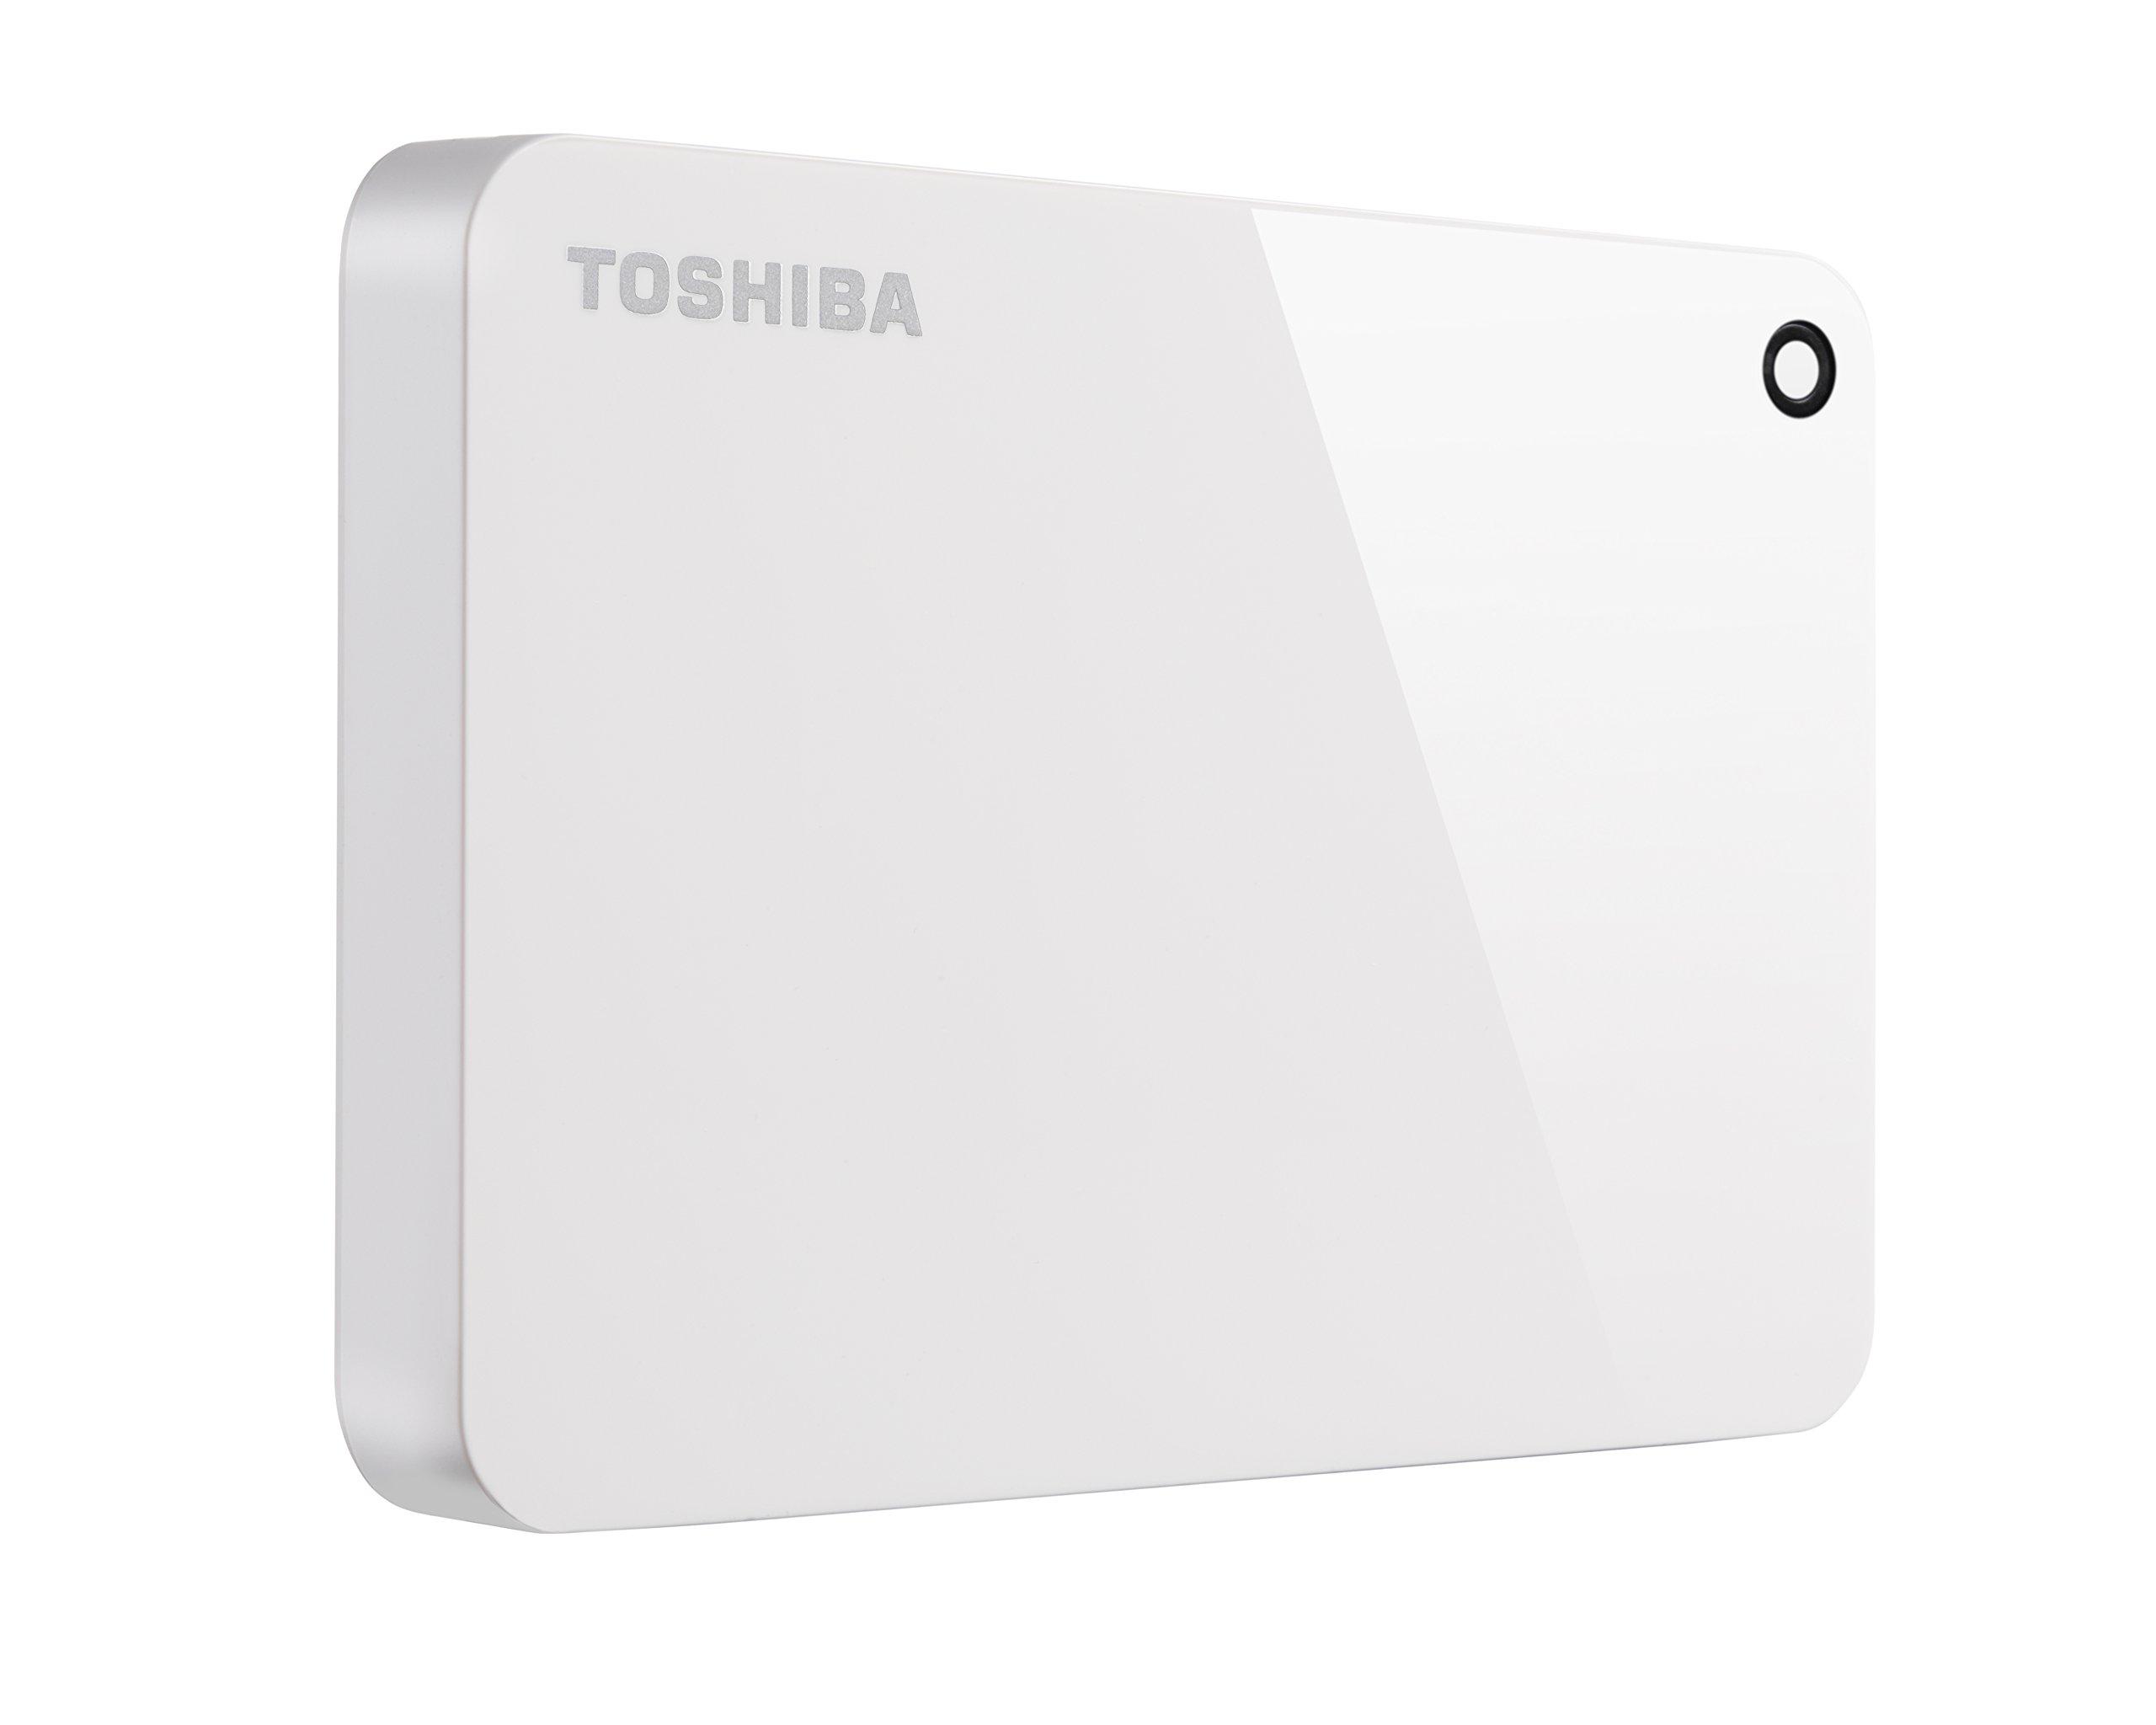 Toshiba Canvio Advance 2TB Portable External Hard Drive USB 3.0, White (HDTC920XW3AA)